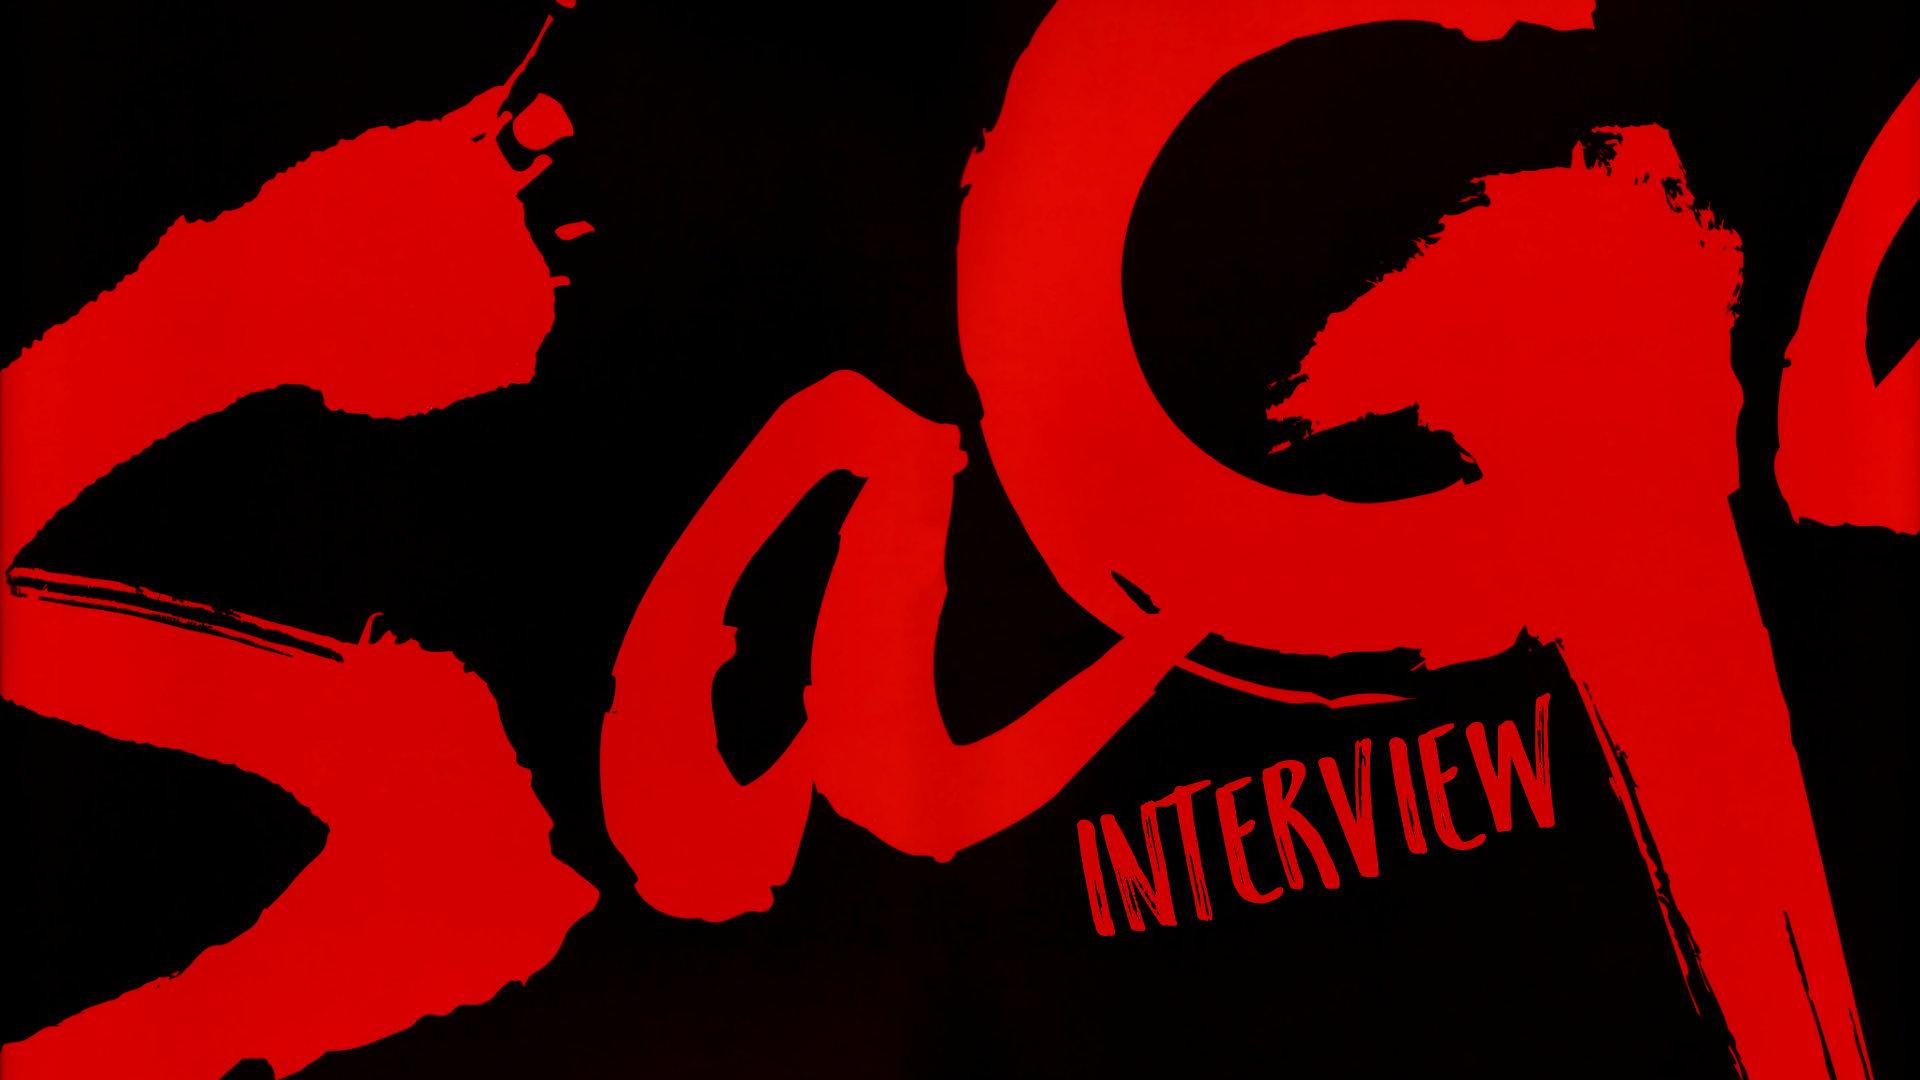 SaGa Series Interview with Akitoshi Kawazu, Hiroyuki Miura, and Masanori Ichikawa